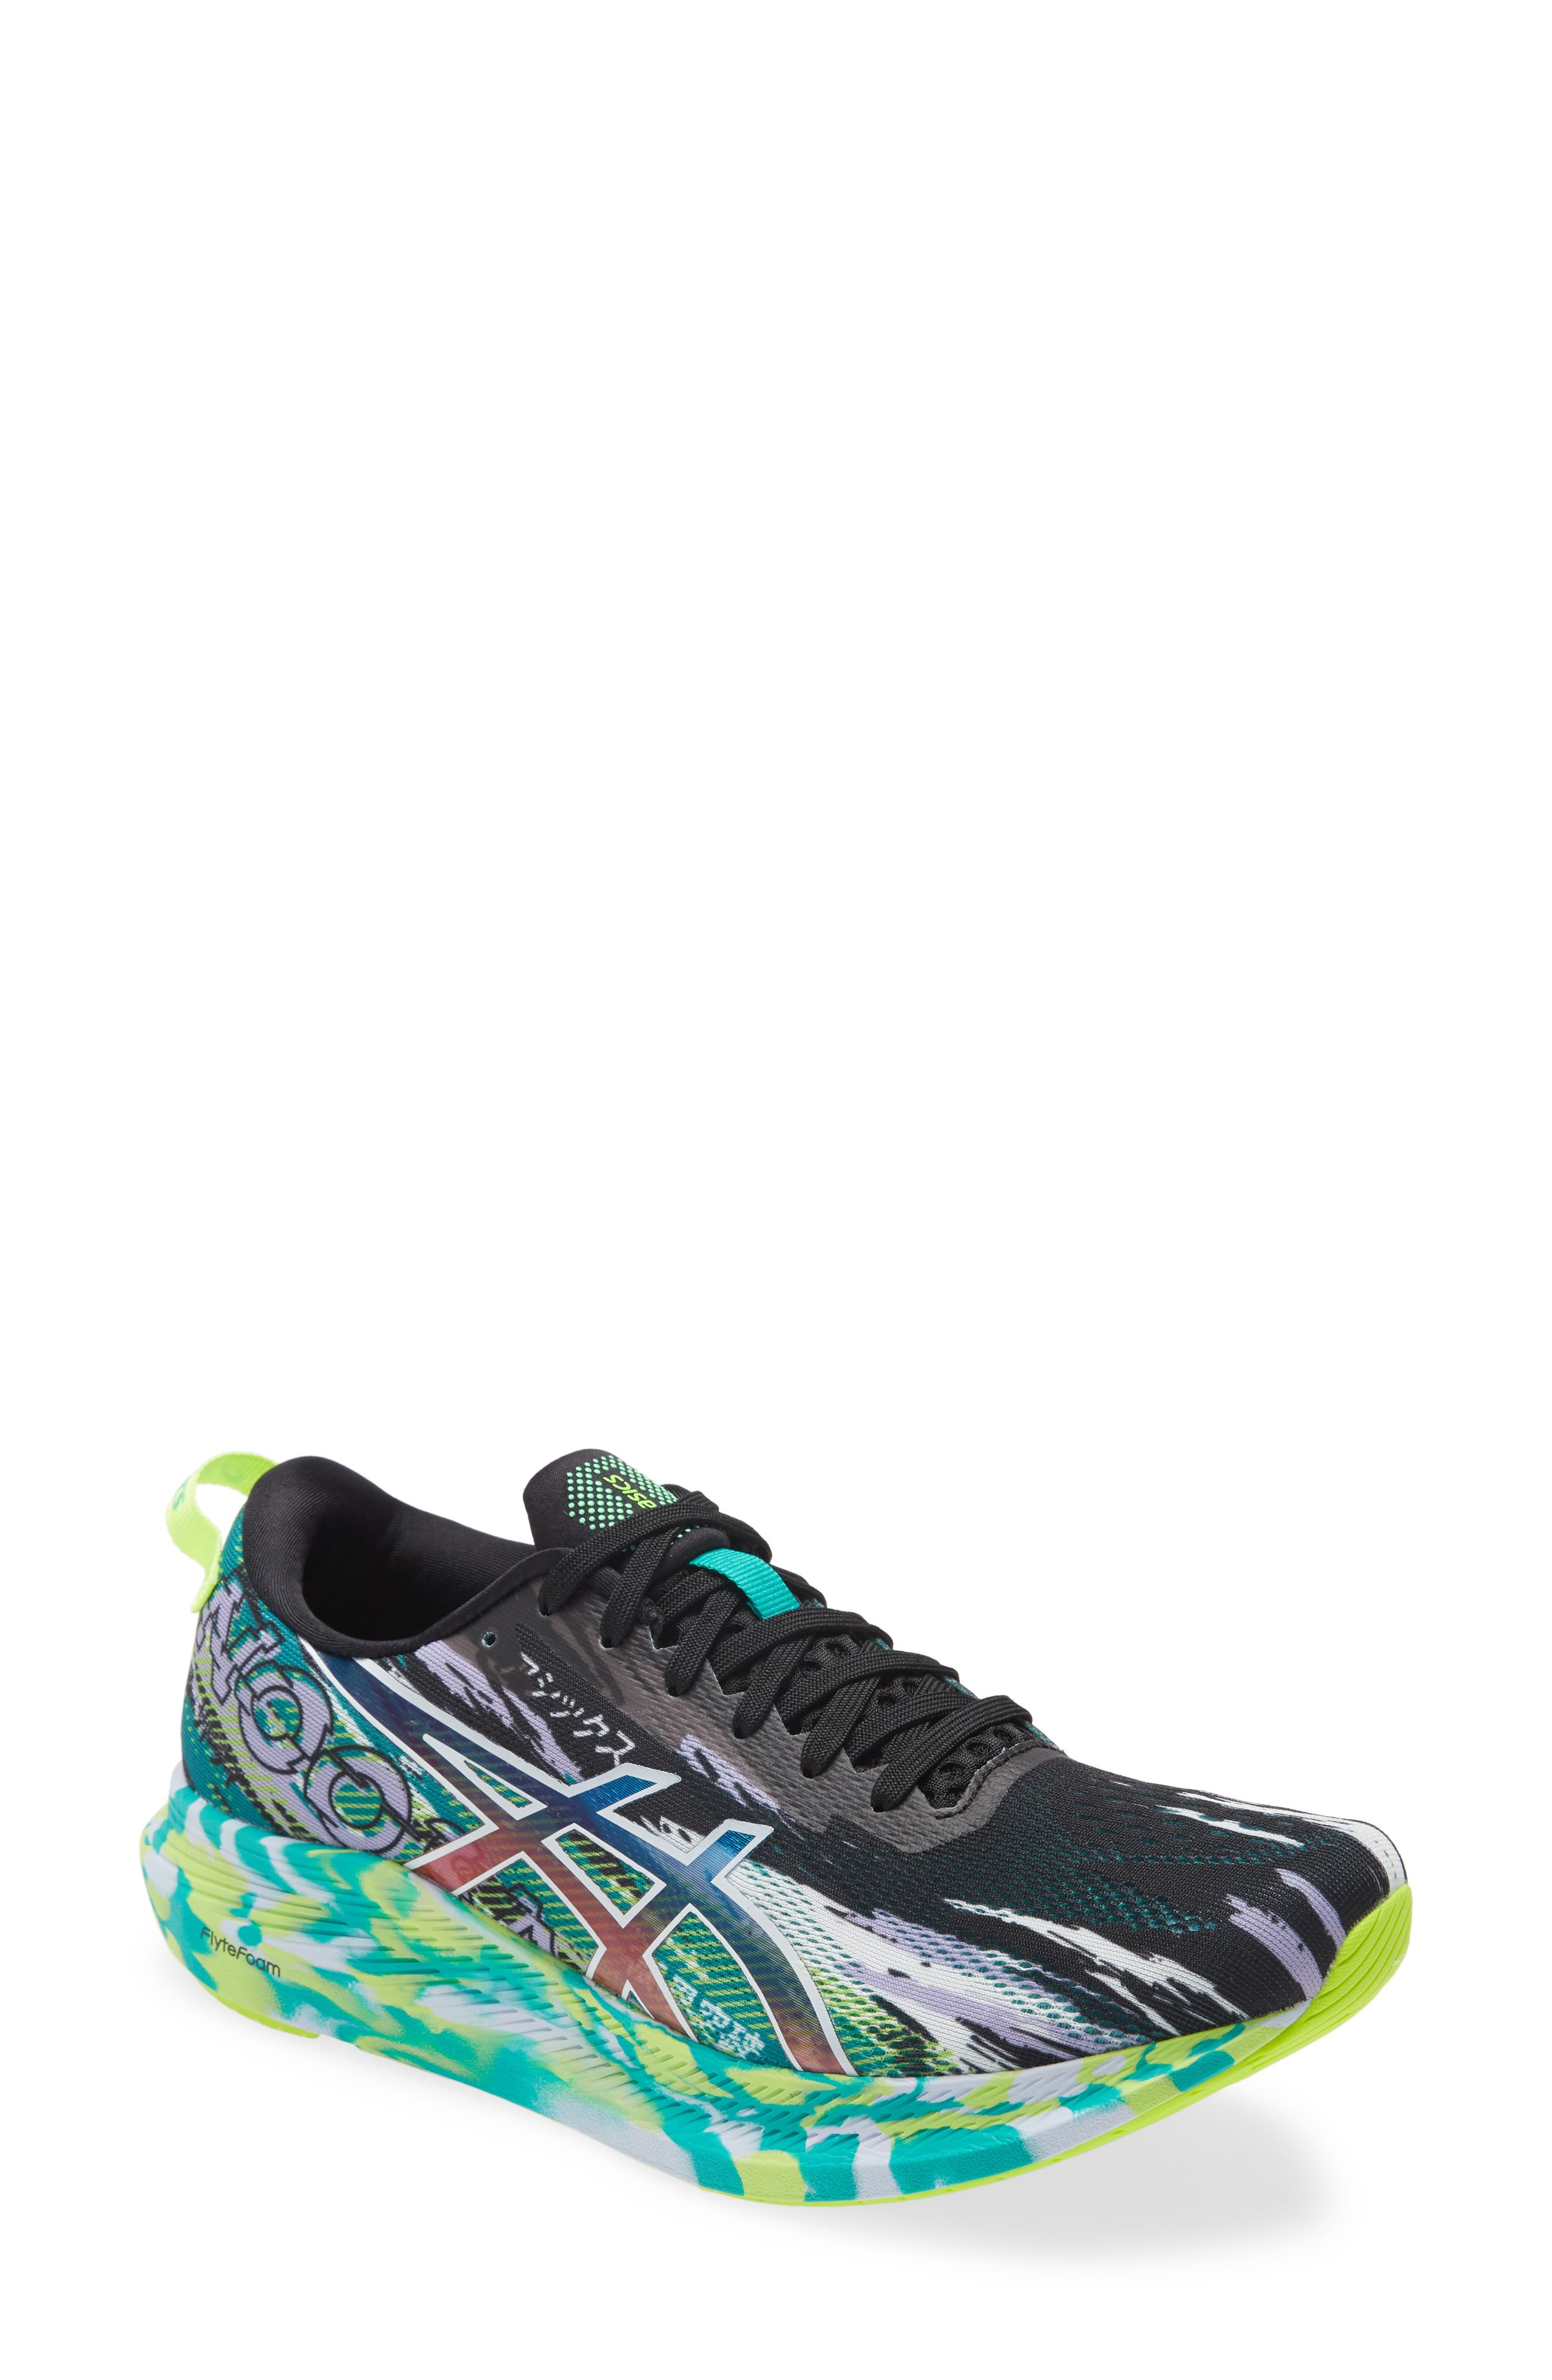 Women's Asics Noosa Tri(TM) 13 Running Shoe